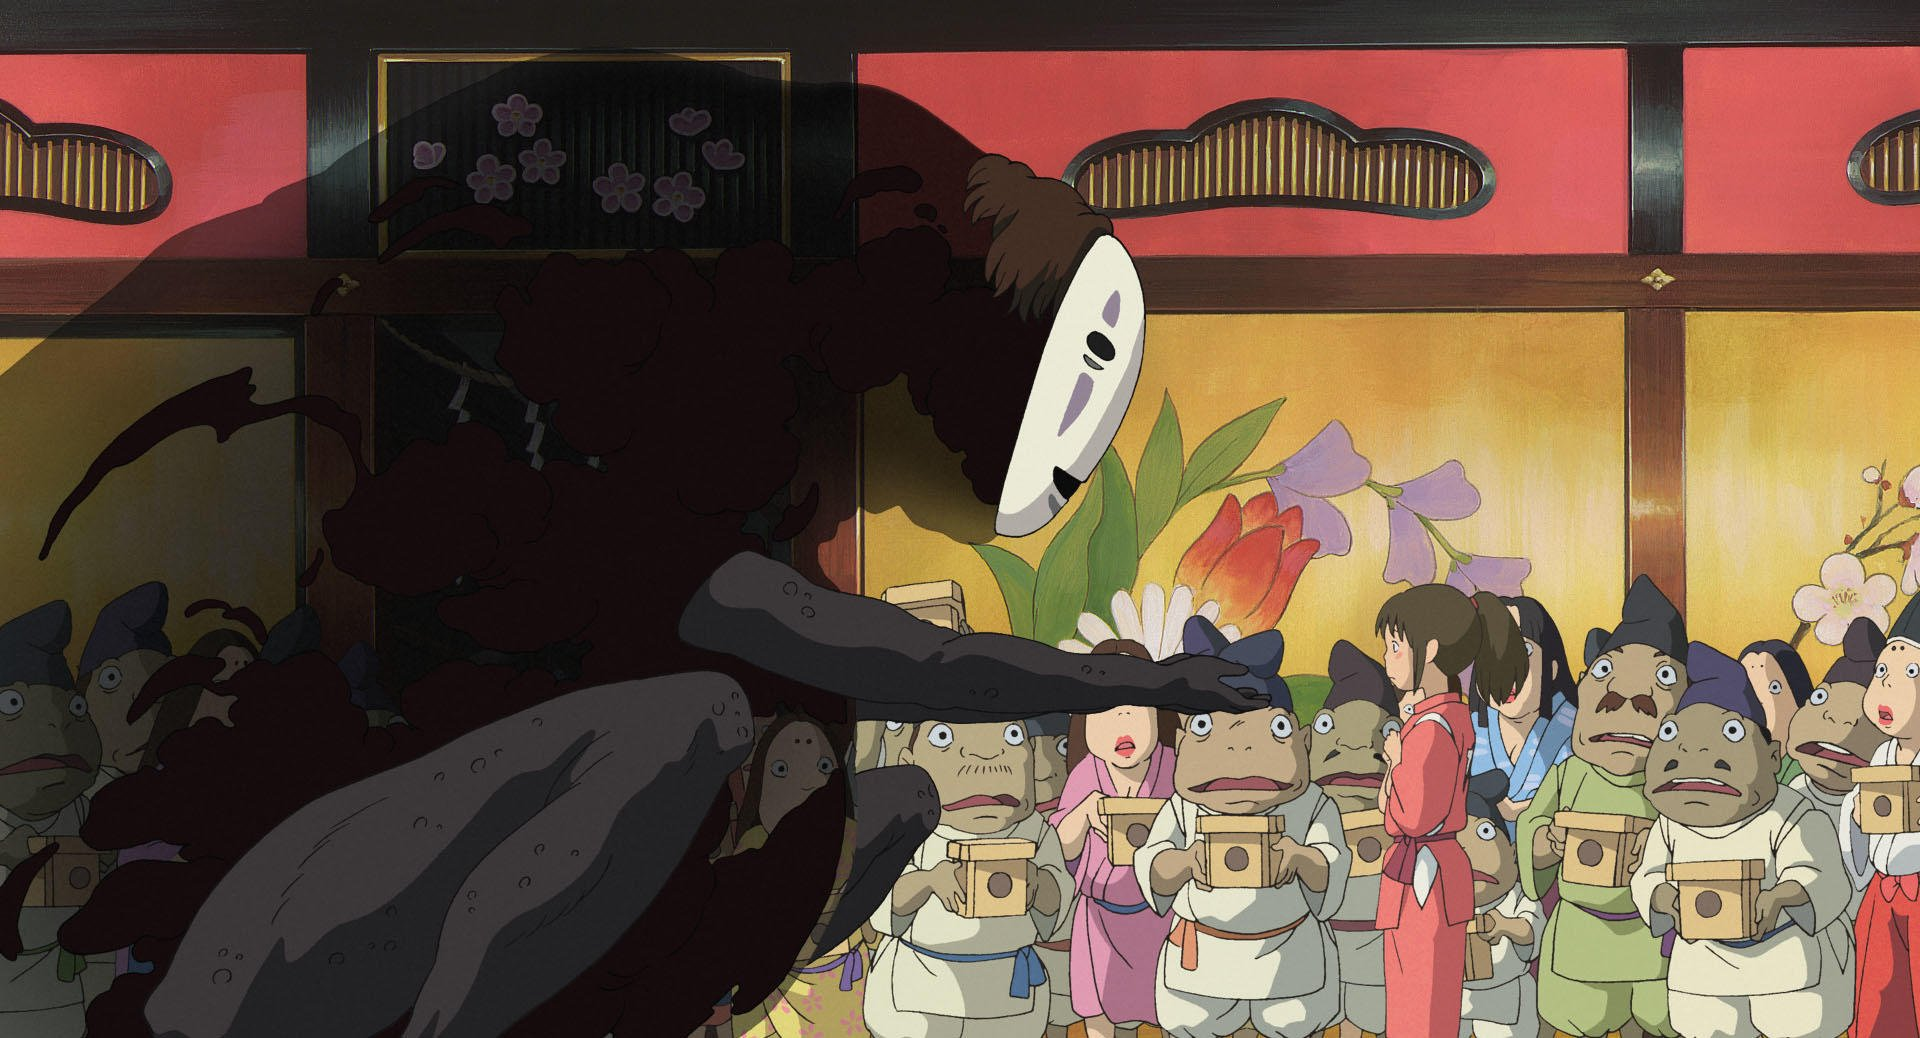 Imagen tomada de 'Sen to Chihiro no Kamikakushi' con el.sin rostro ofreciéndole comida oro a Chihiro.